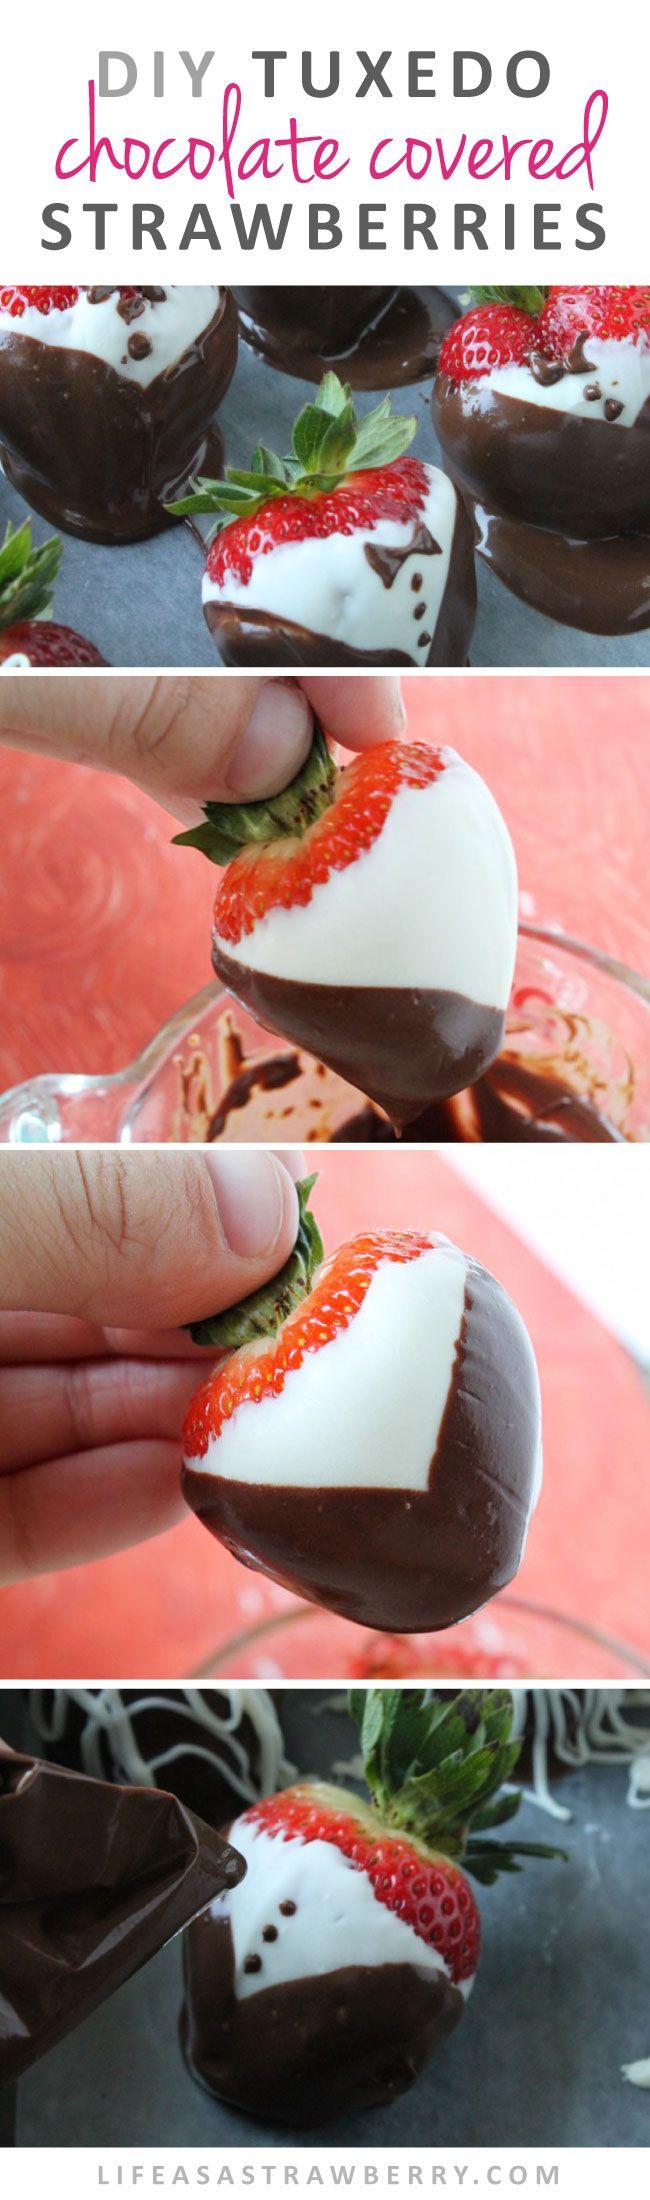 Tuxedo Chocolate Covered Strawberries | Make your own gourmet chocolate strawberries at home with this easy recipe and photo tutorial!